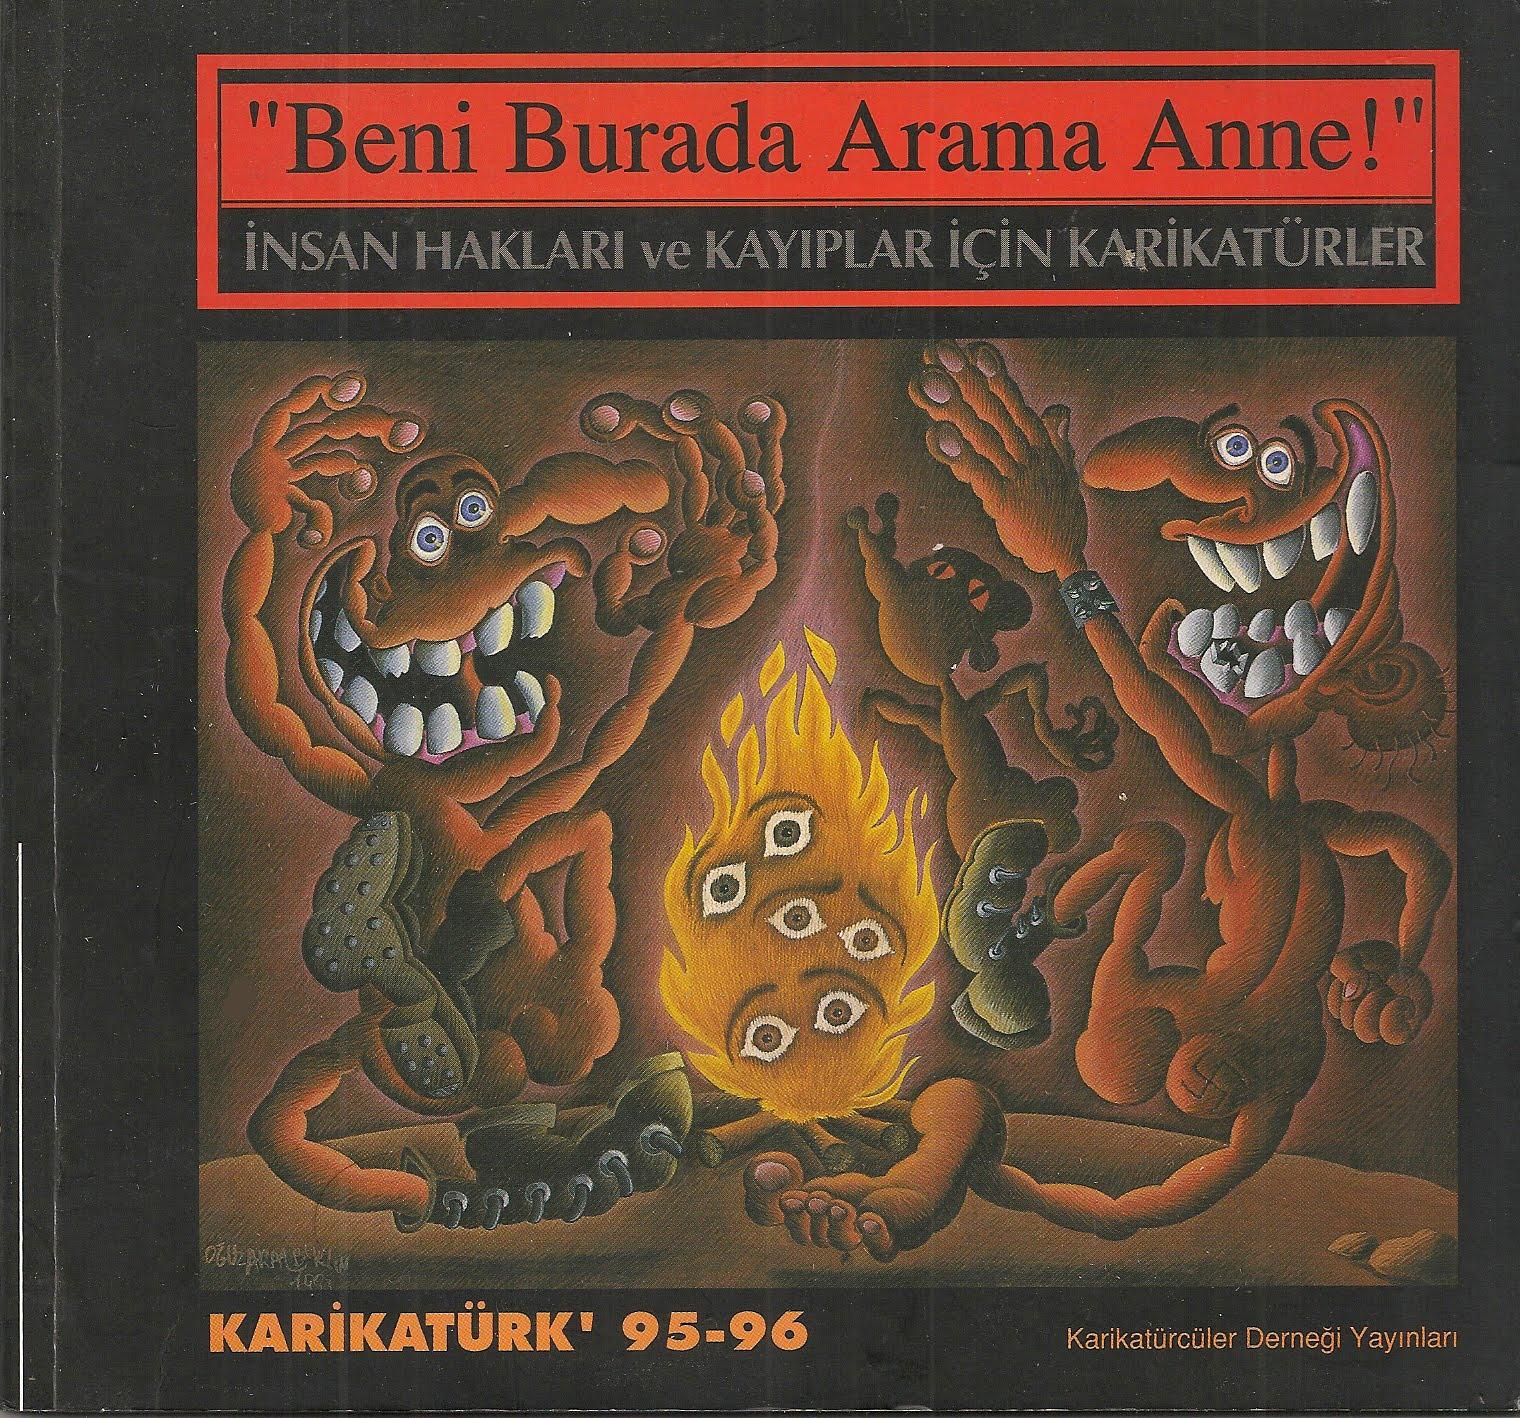 BENİ BURADA ARAMA ANNE